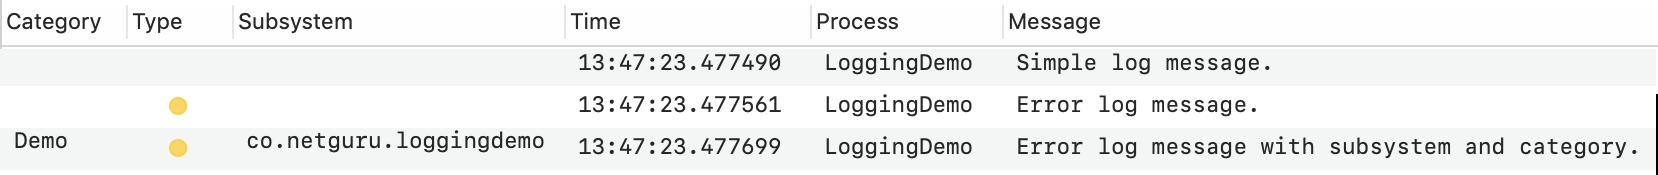 iOS Logging practices | Netguru Blog on iOS